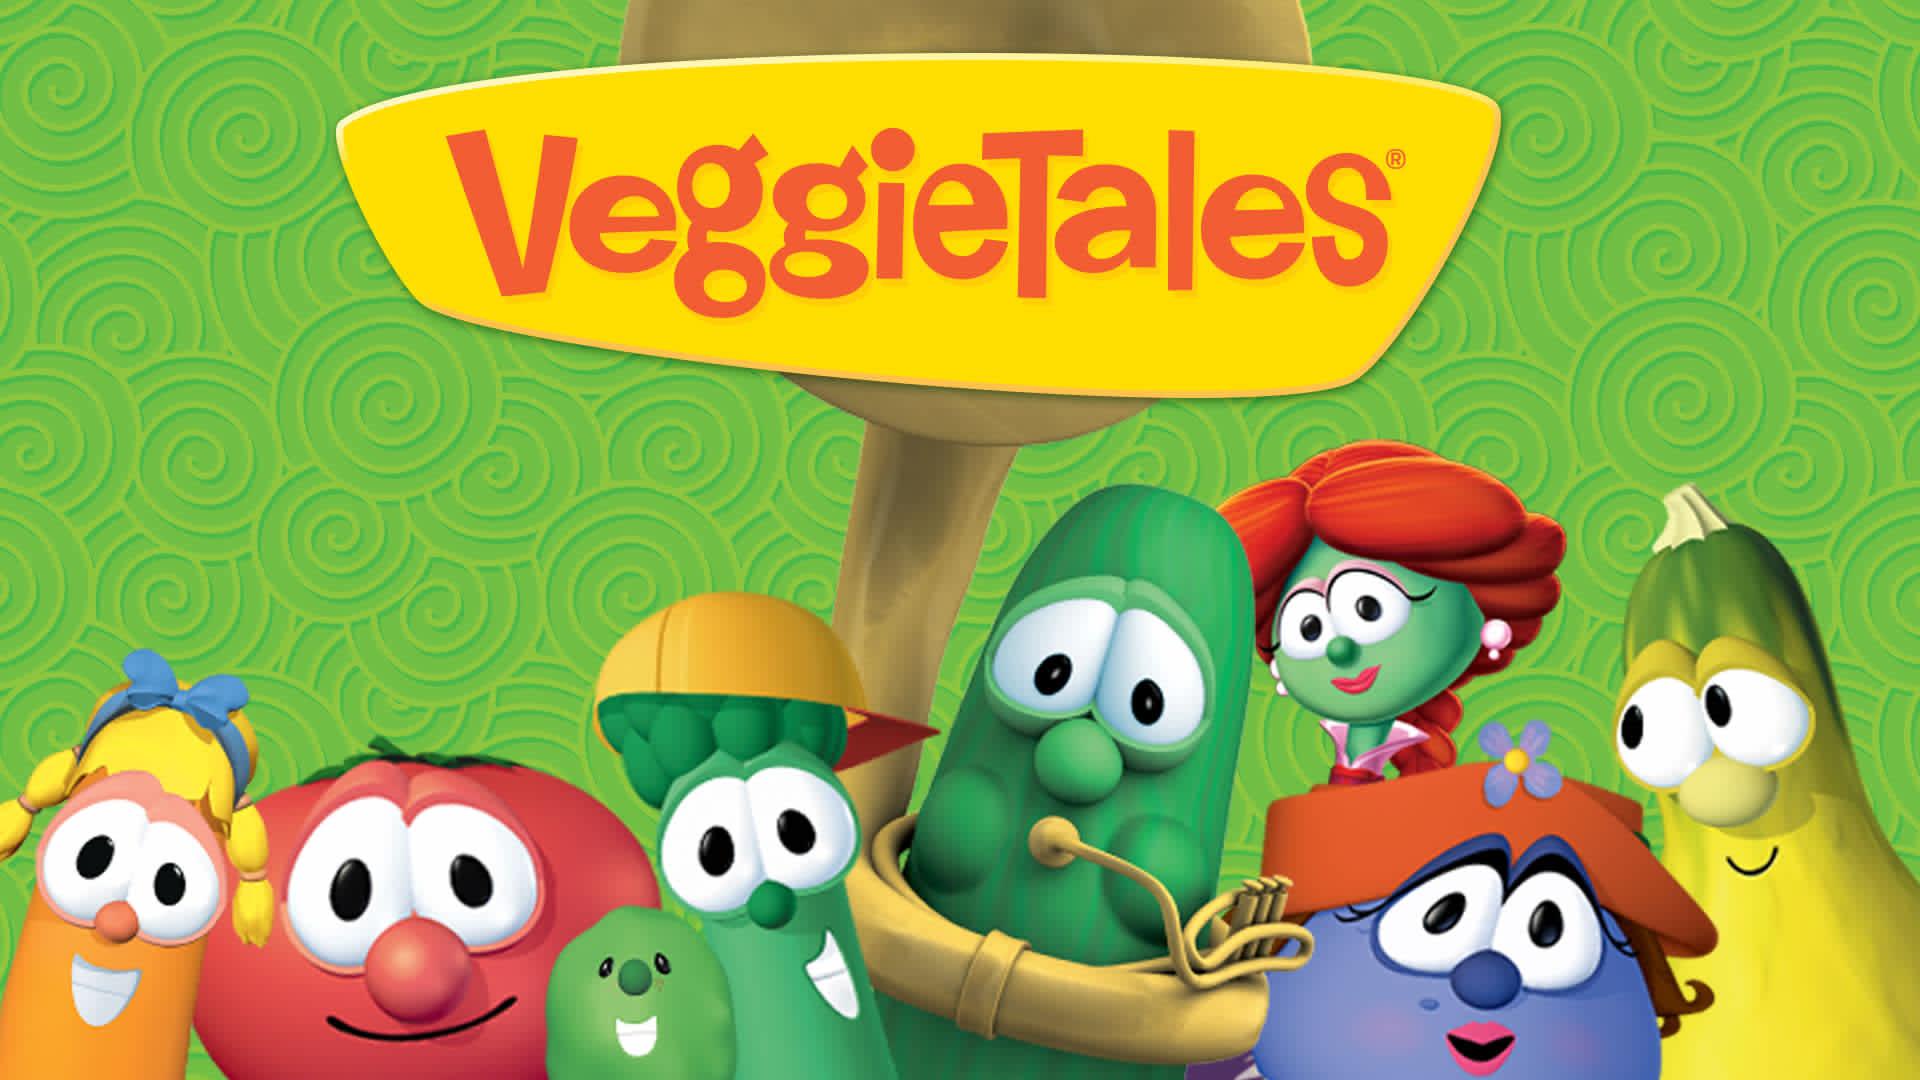 veggietales-show-logo.jpg